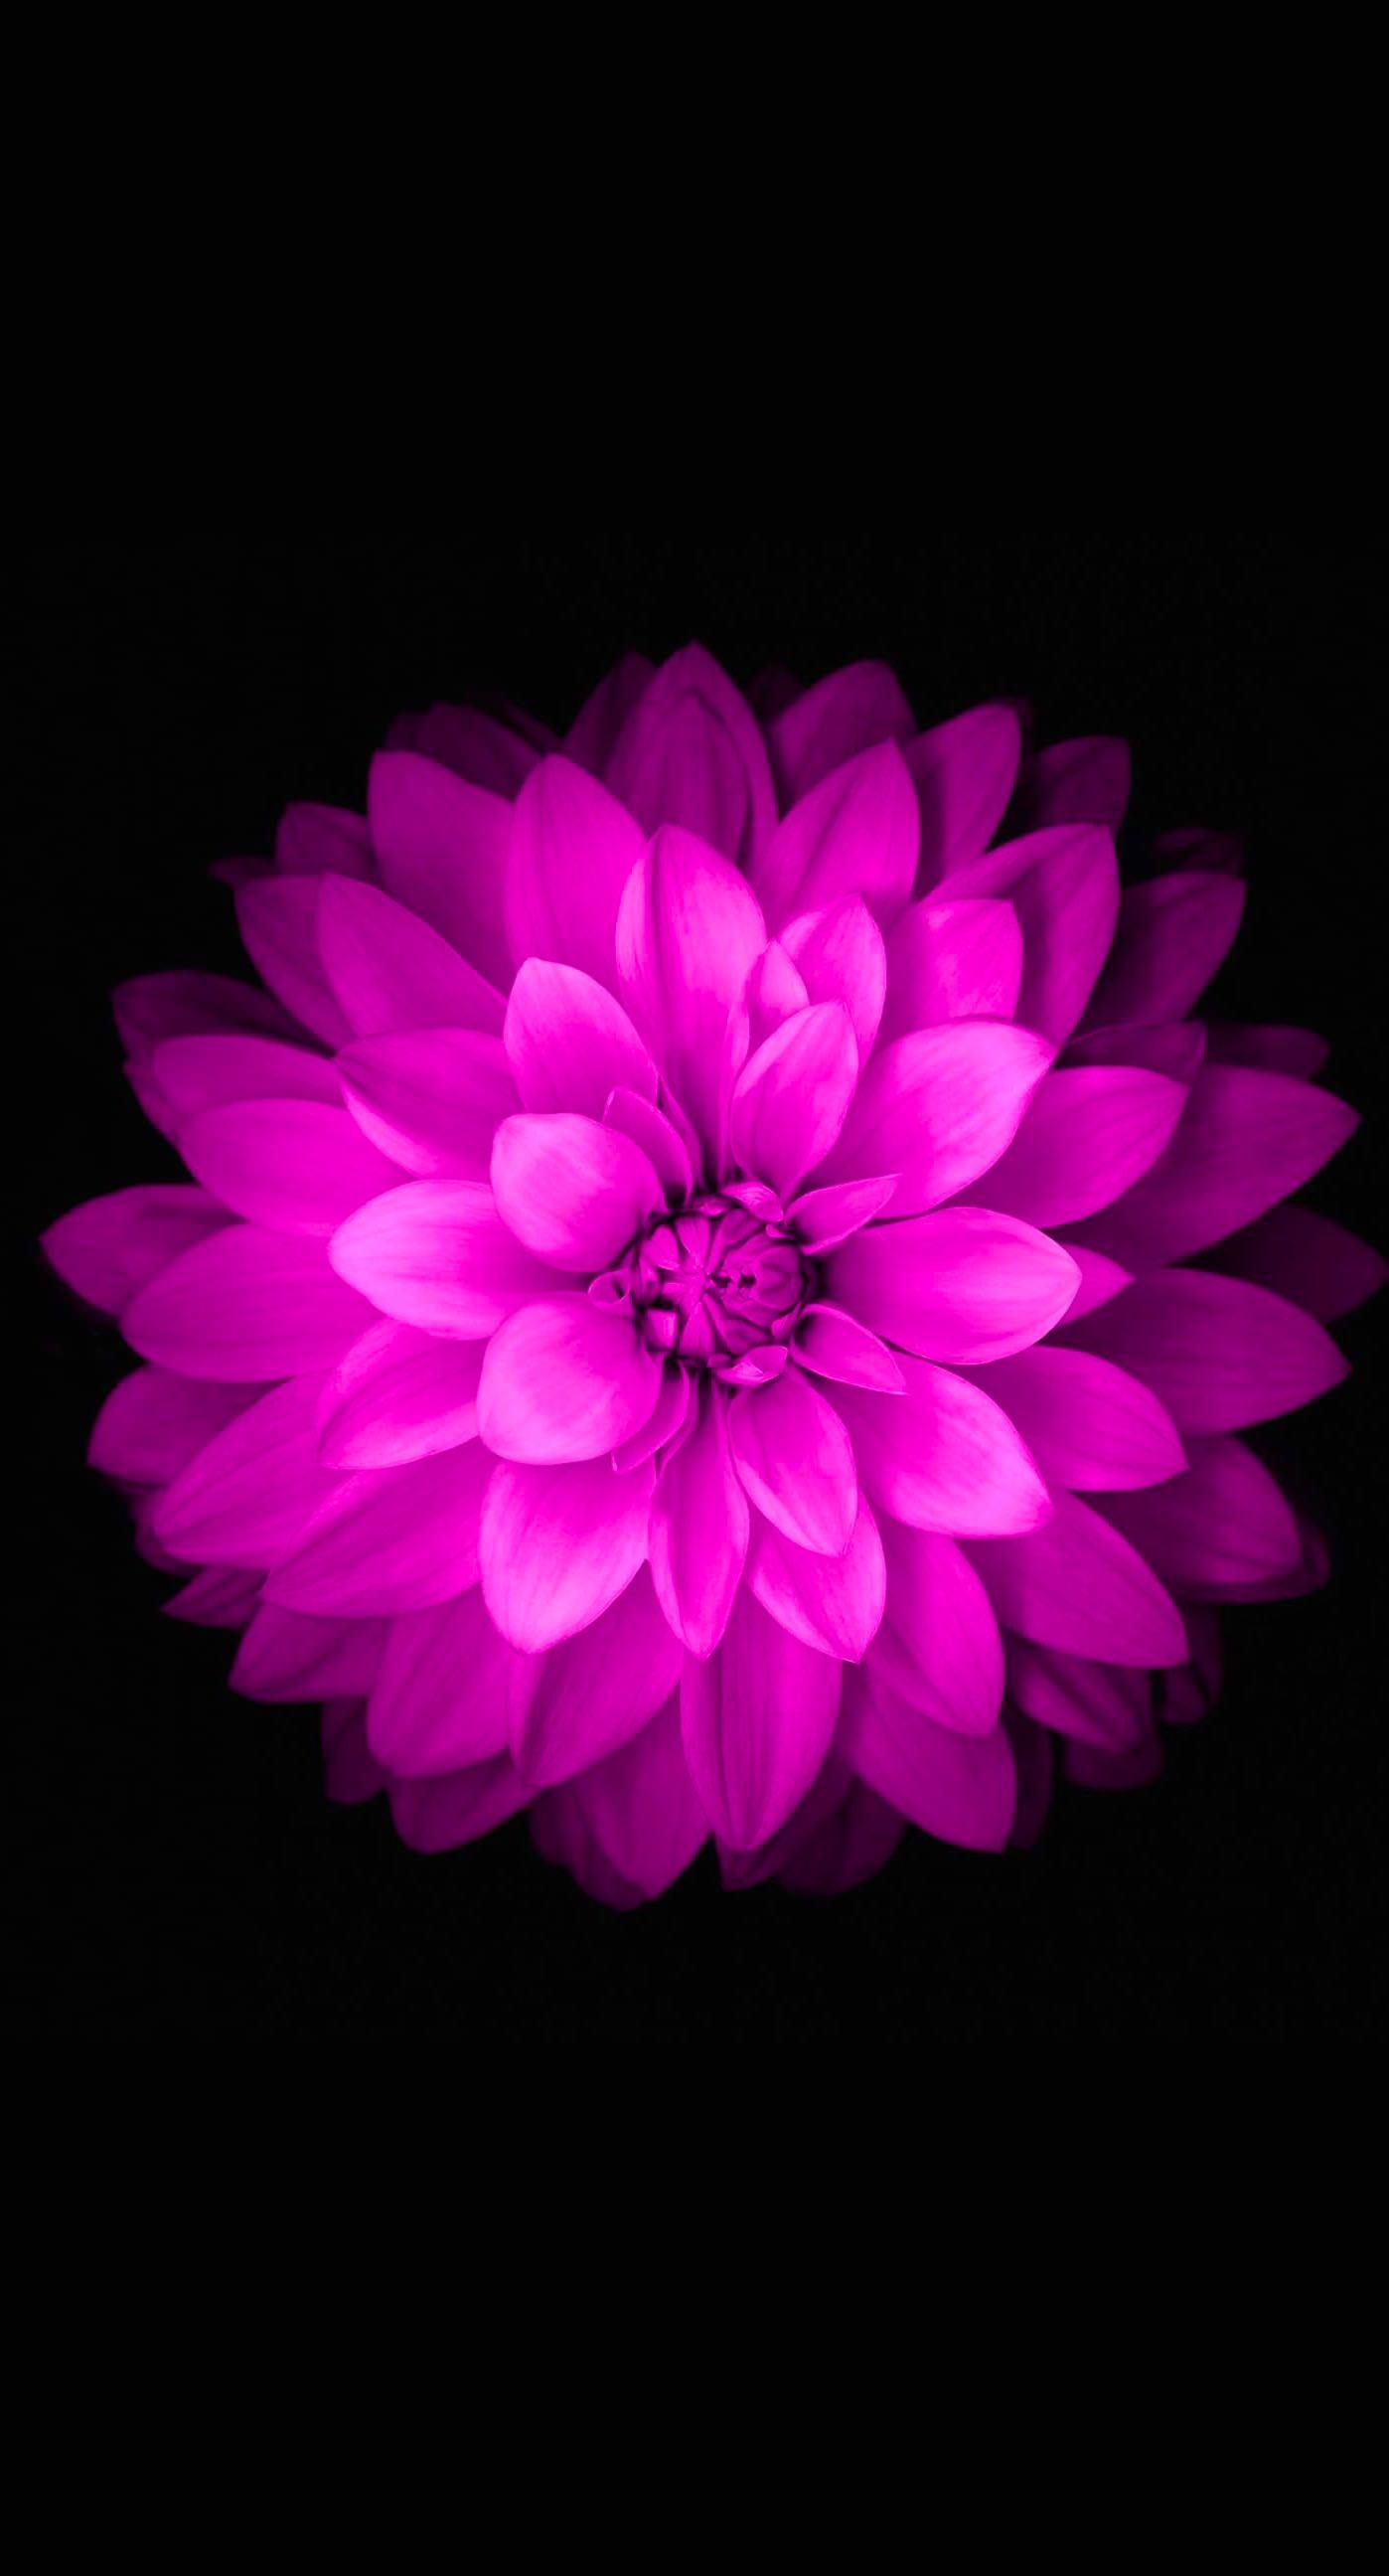 Flowers Purple Black Wallpaper Sc Iphone6splus